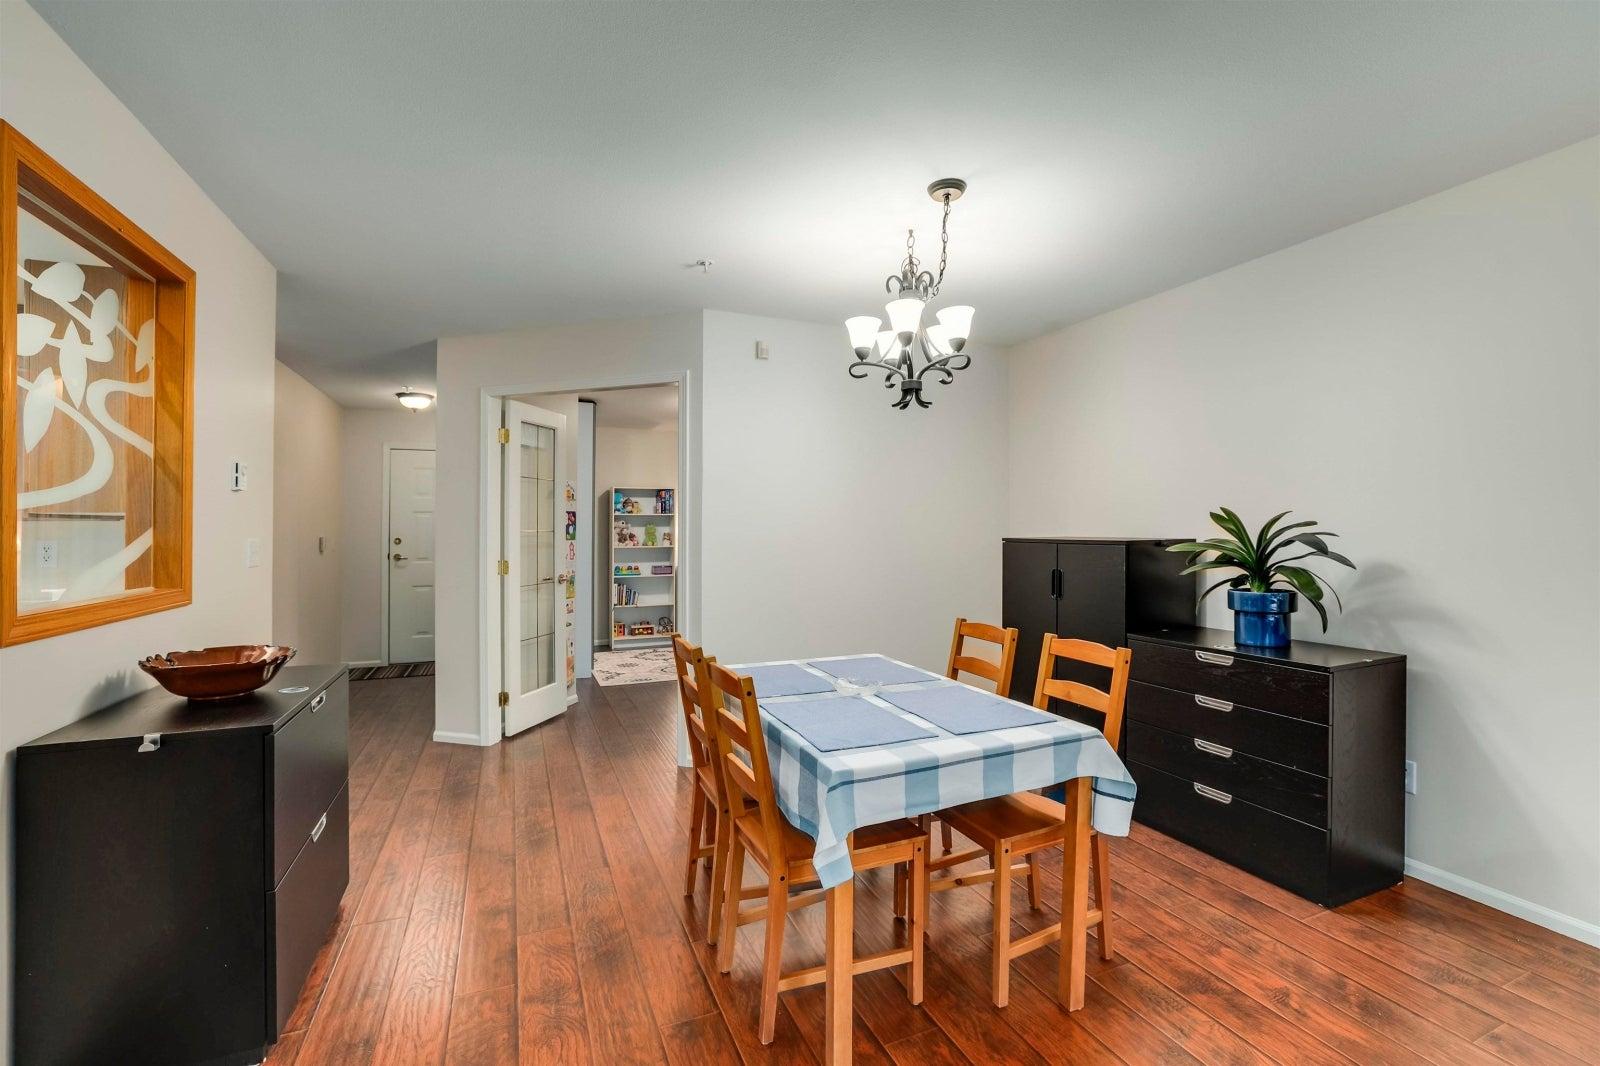 103 1132 DUFFERIN STREET - Eagle Ridge CQ Apartment/Condo for sale, 2 Bedrooms (R2618654) #5